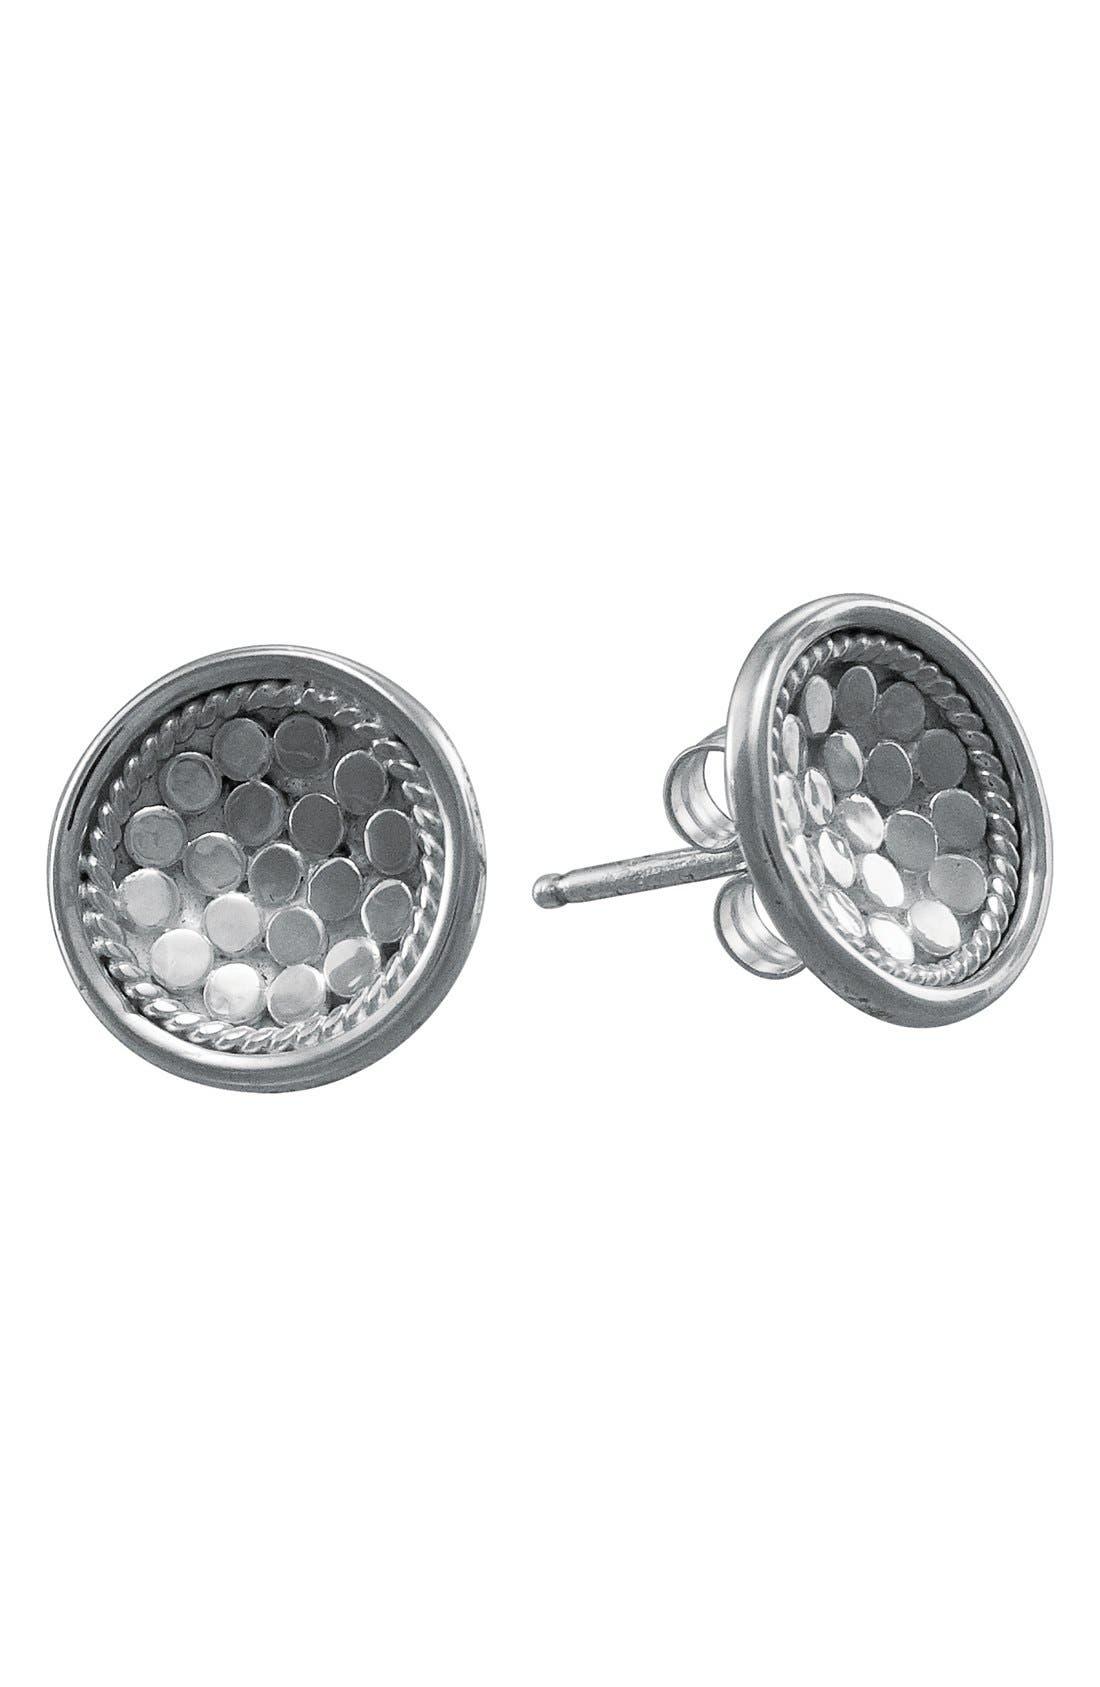 Main Image - Anna Beck 'Gili' Small Dish Stud Earrings